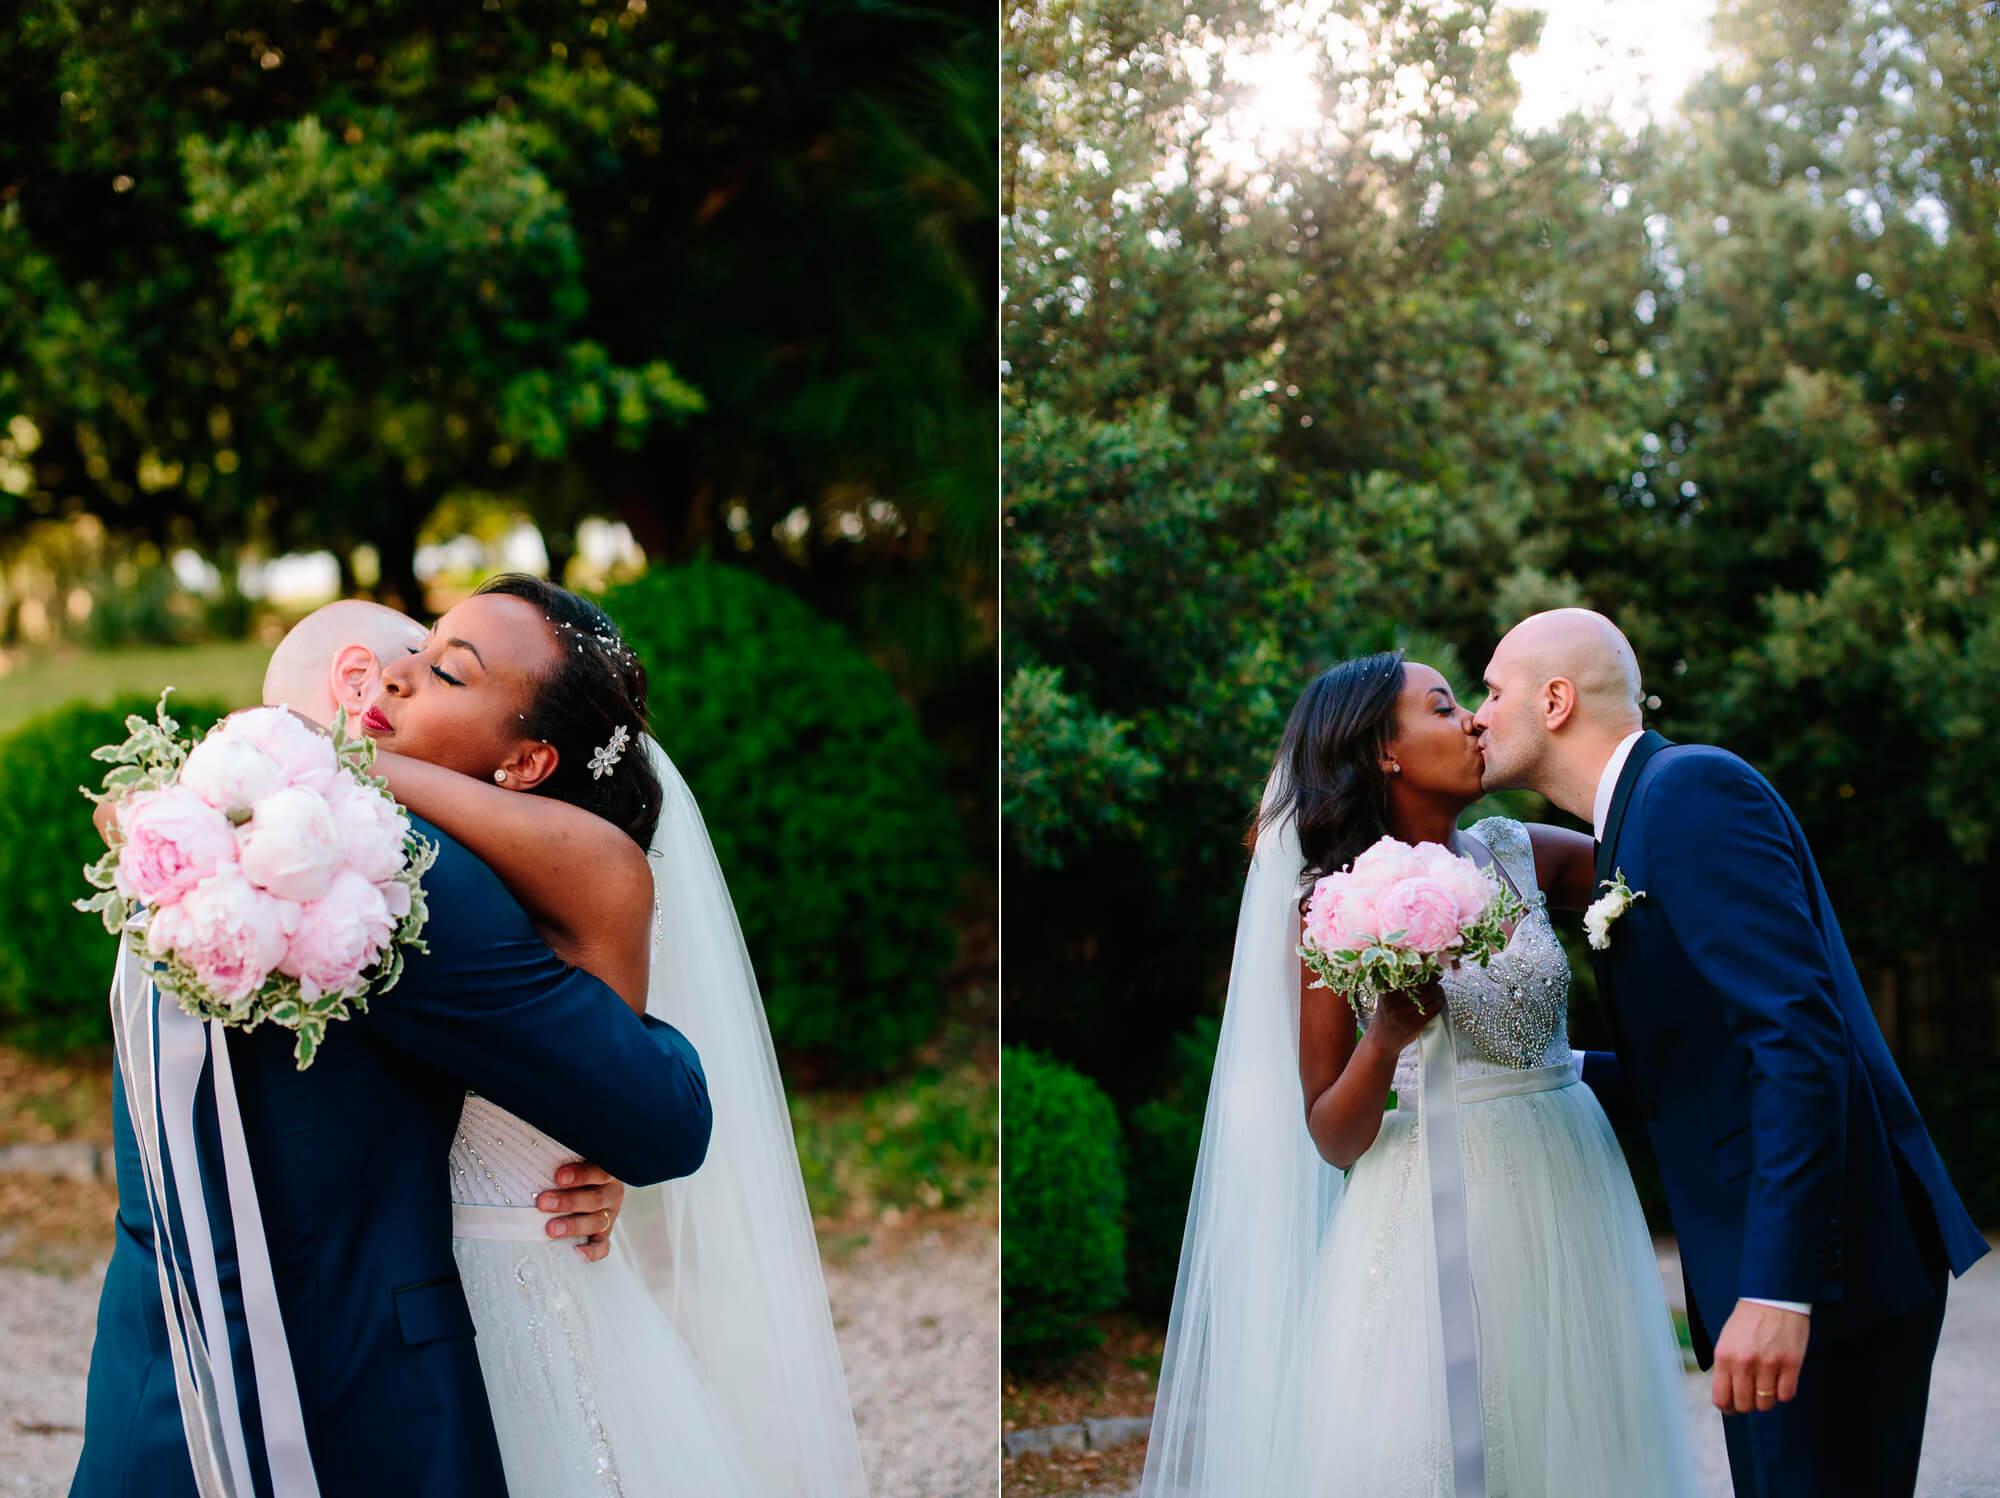 076-sorrento-wedding-photographer.jpg